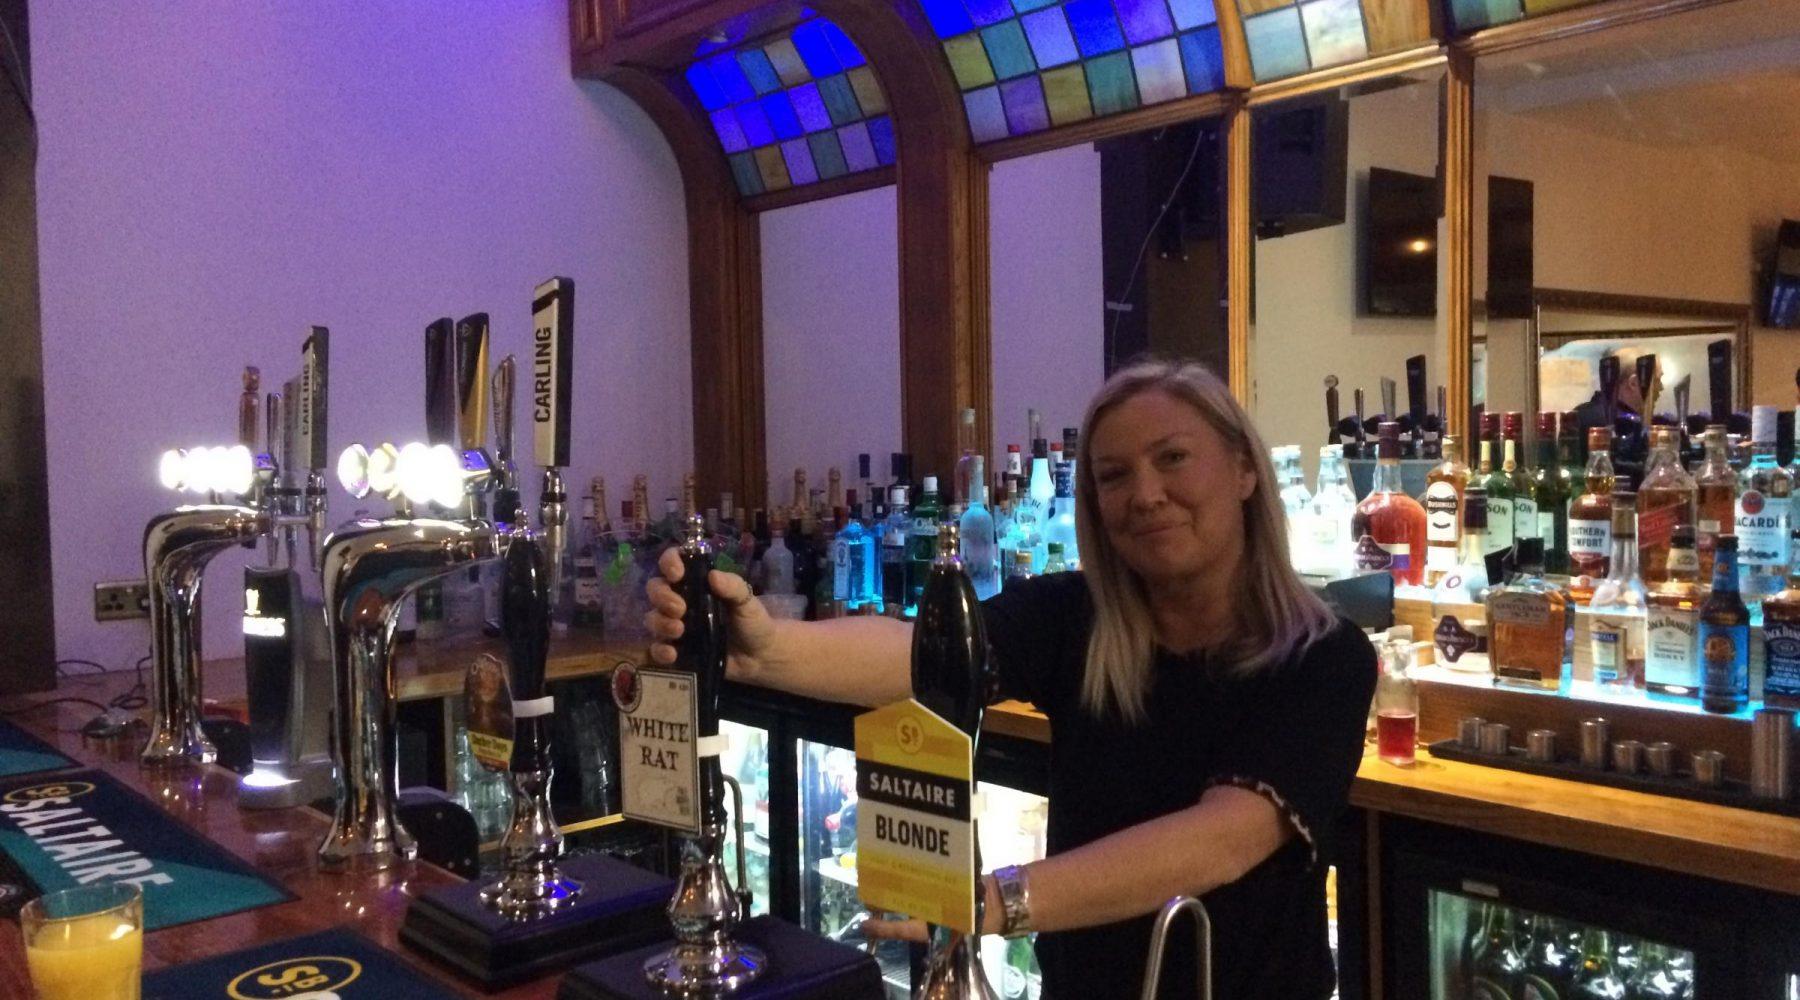 Silver Fox pub opens in old Bradford cooker…